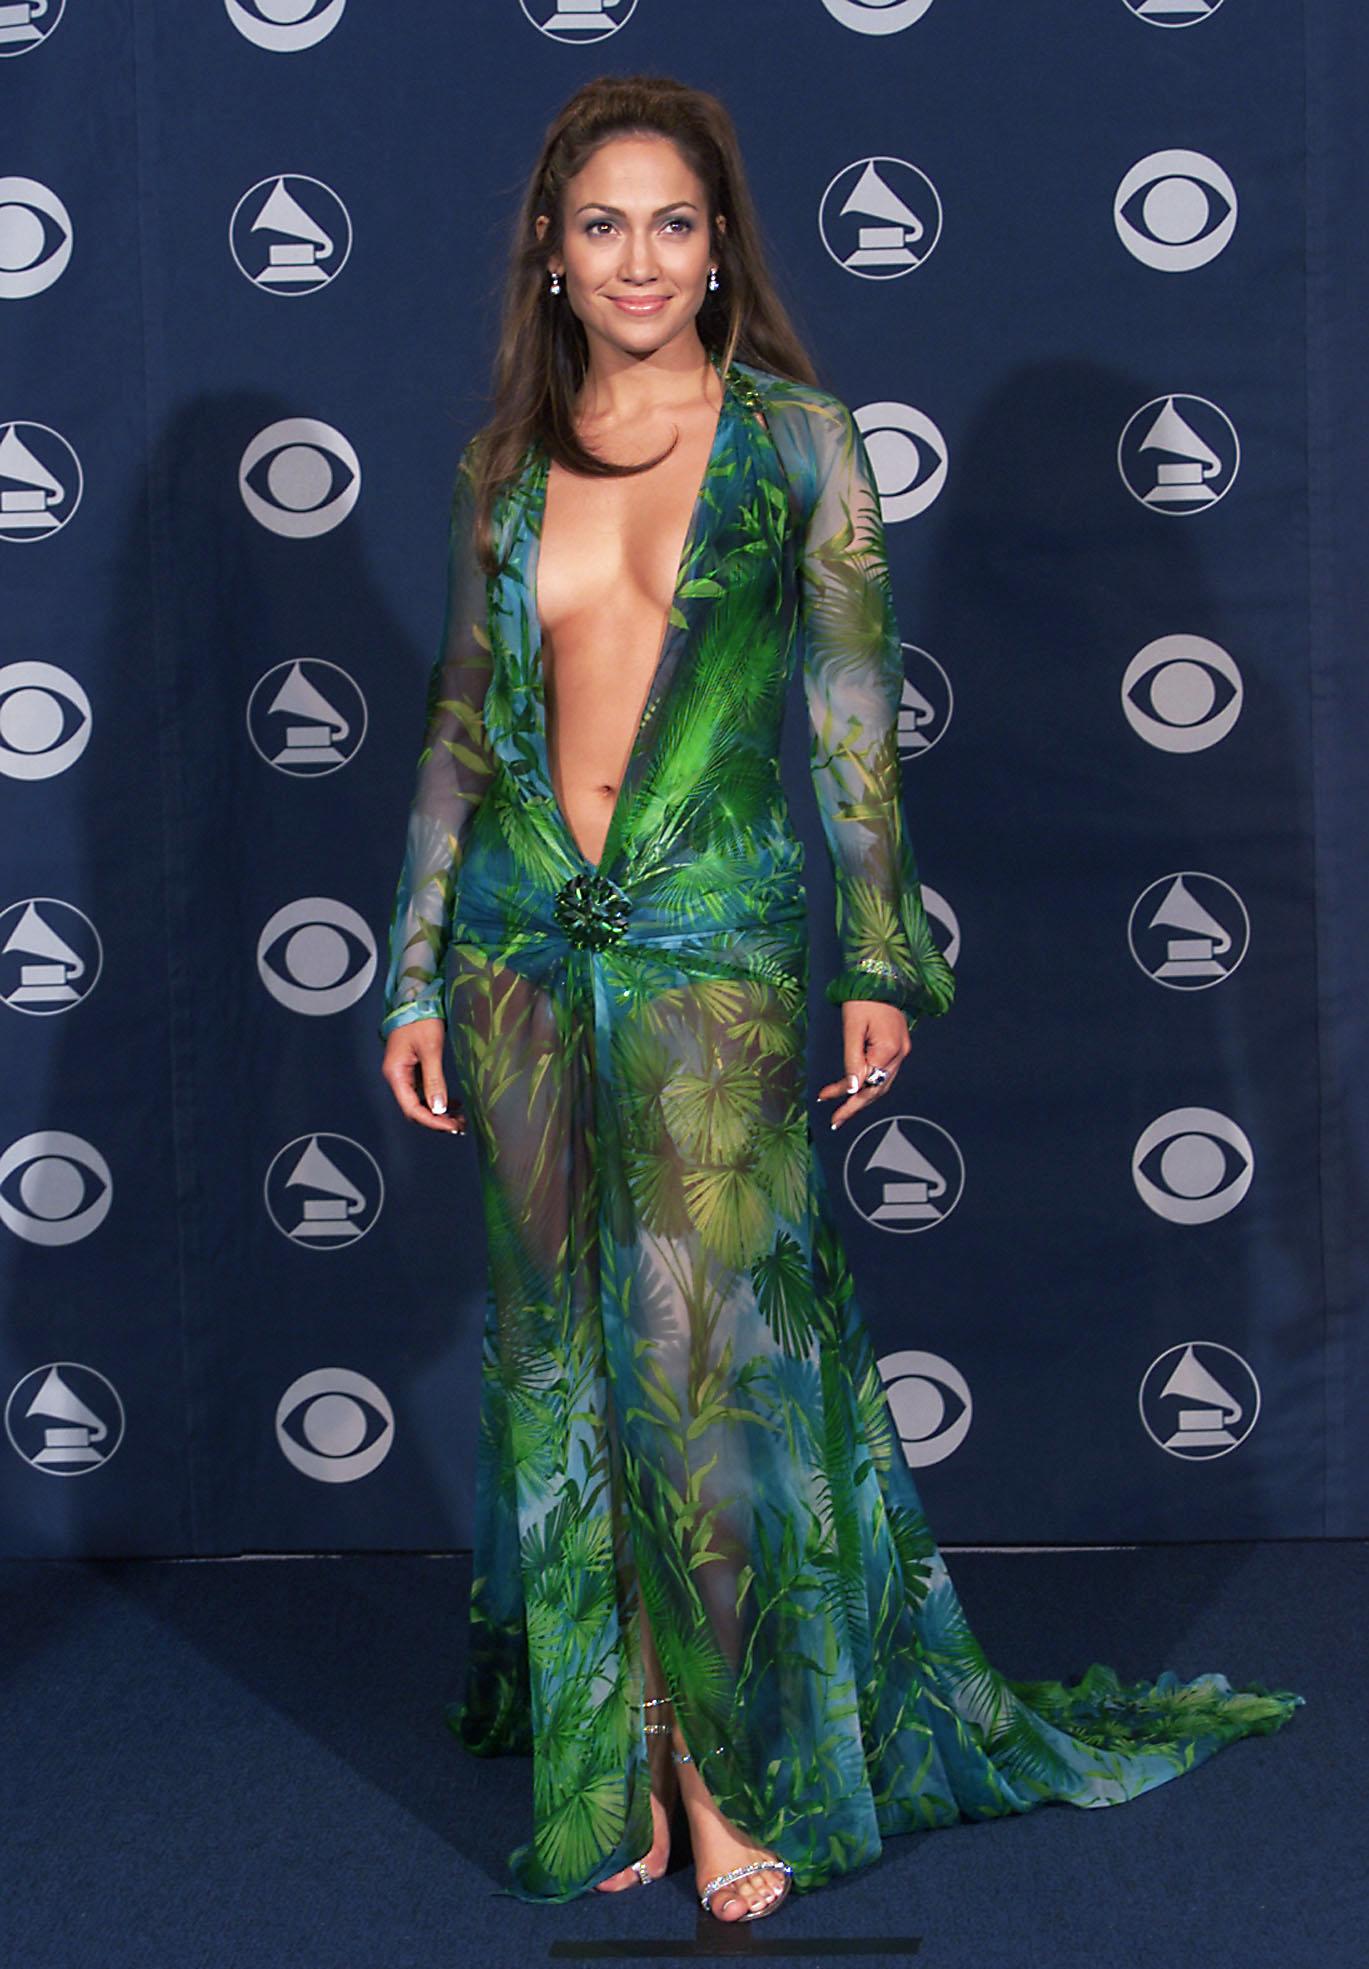 Jennifer Lopez wears Versace at the 42nd Grammy Awards held in Los Angeles on Feb. 23, 2000.